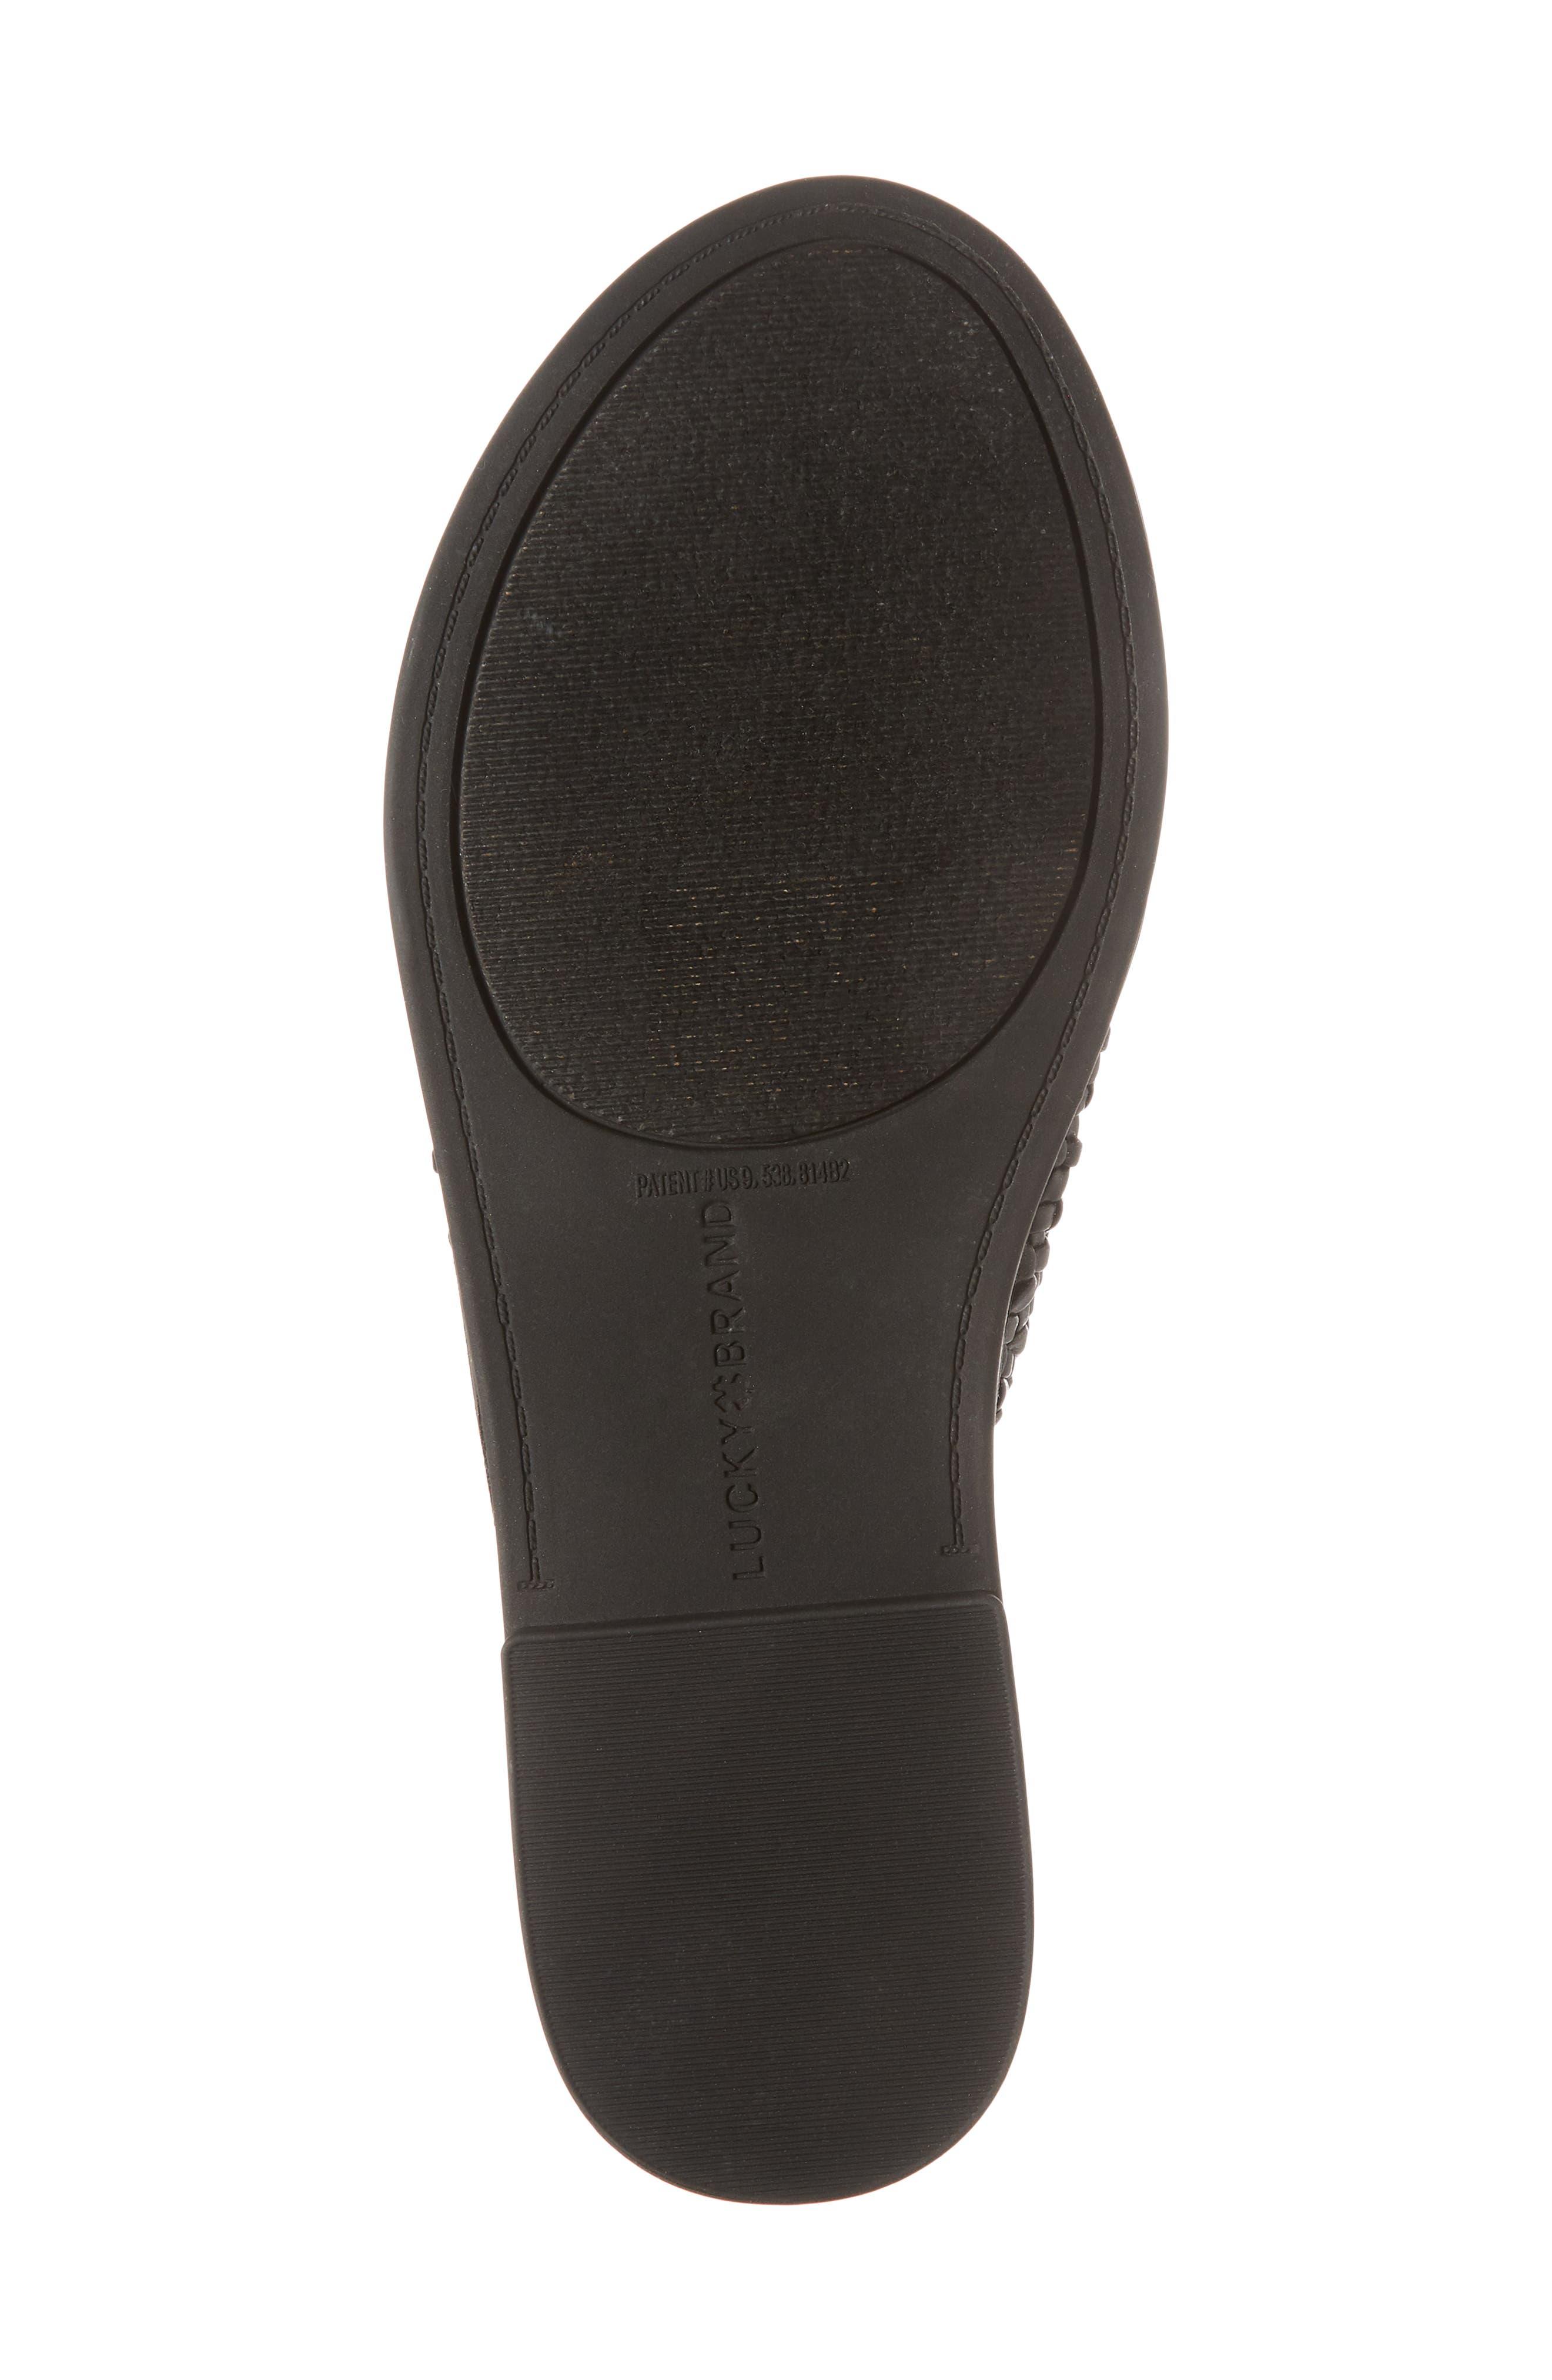 Adola Slide Sandal,                             Alternate thumbnail 6, color,                             Black Leather